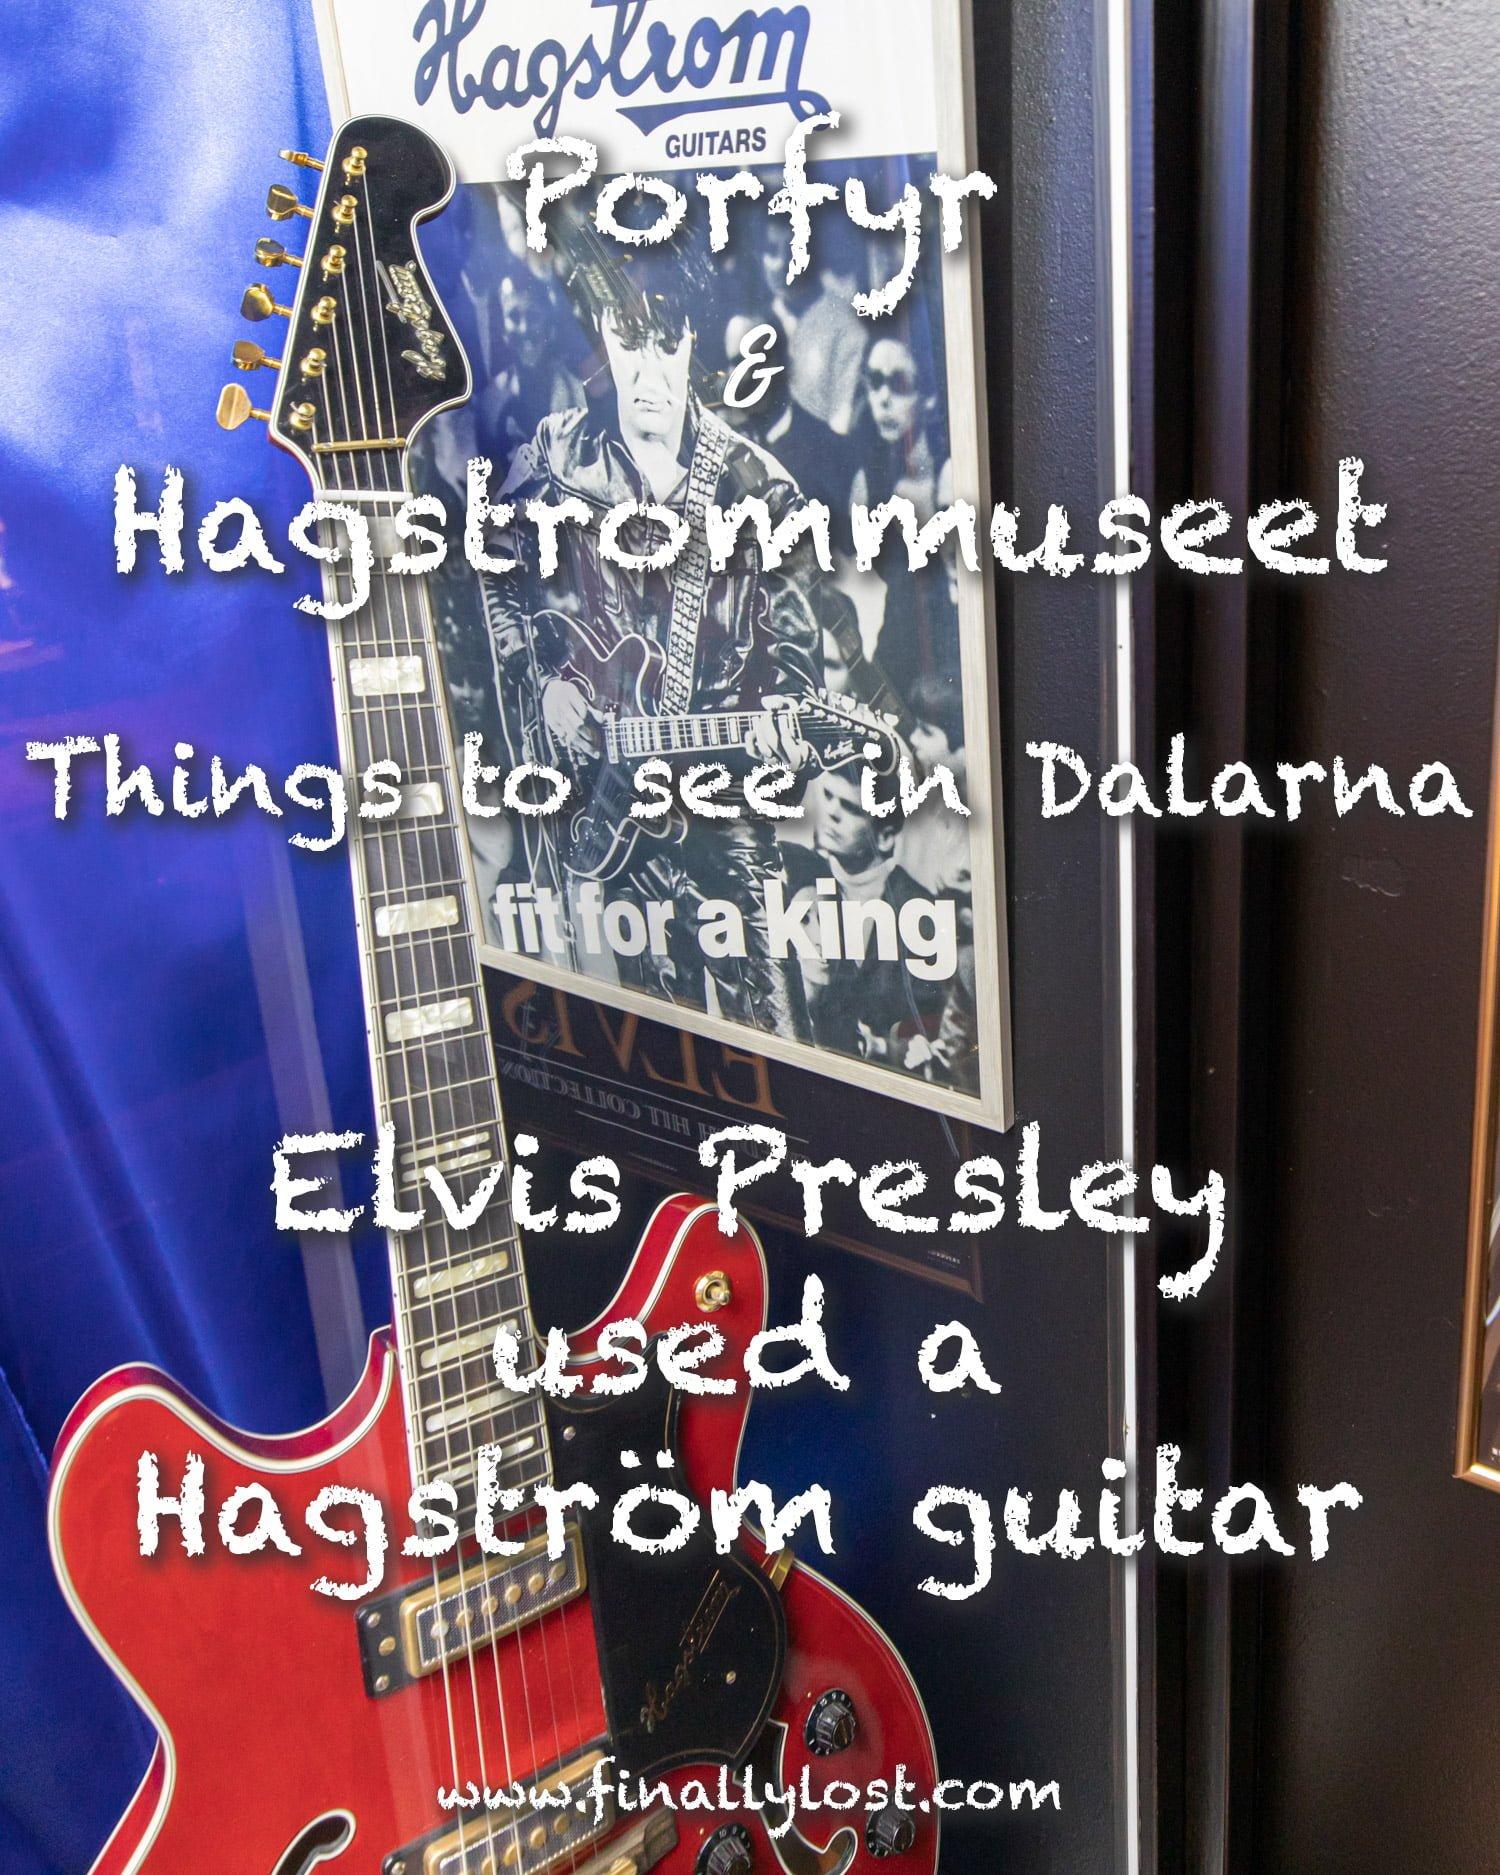 Elvis Presley used a Hagström guitar